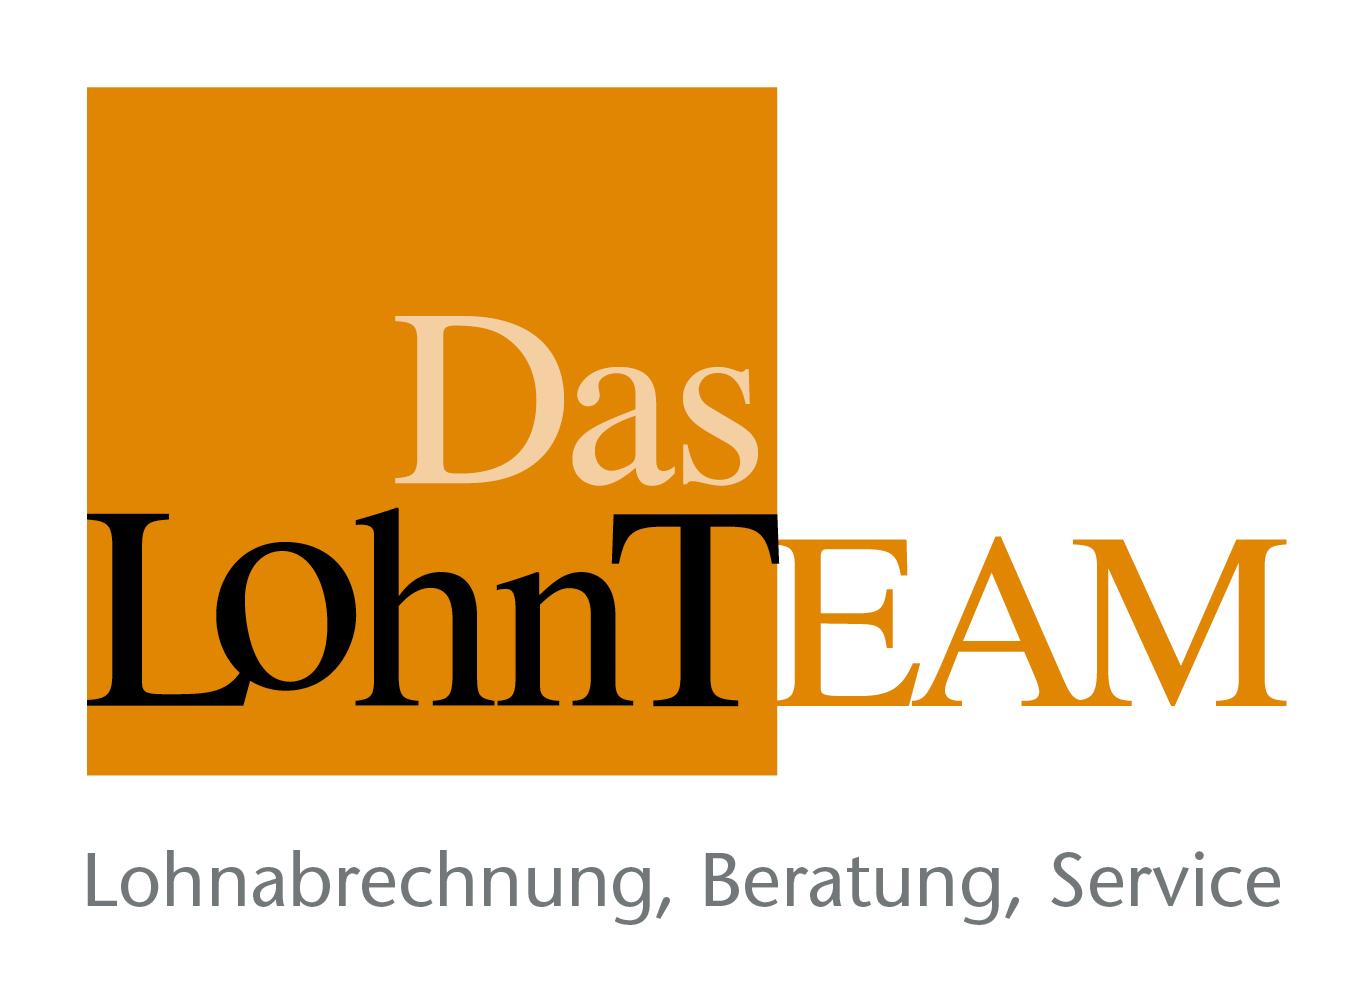 Lohnteam logo aktuell